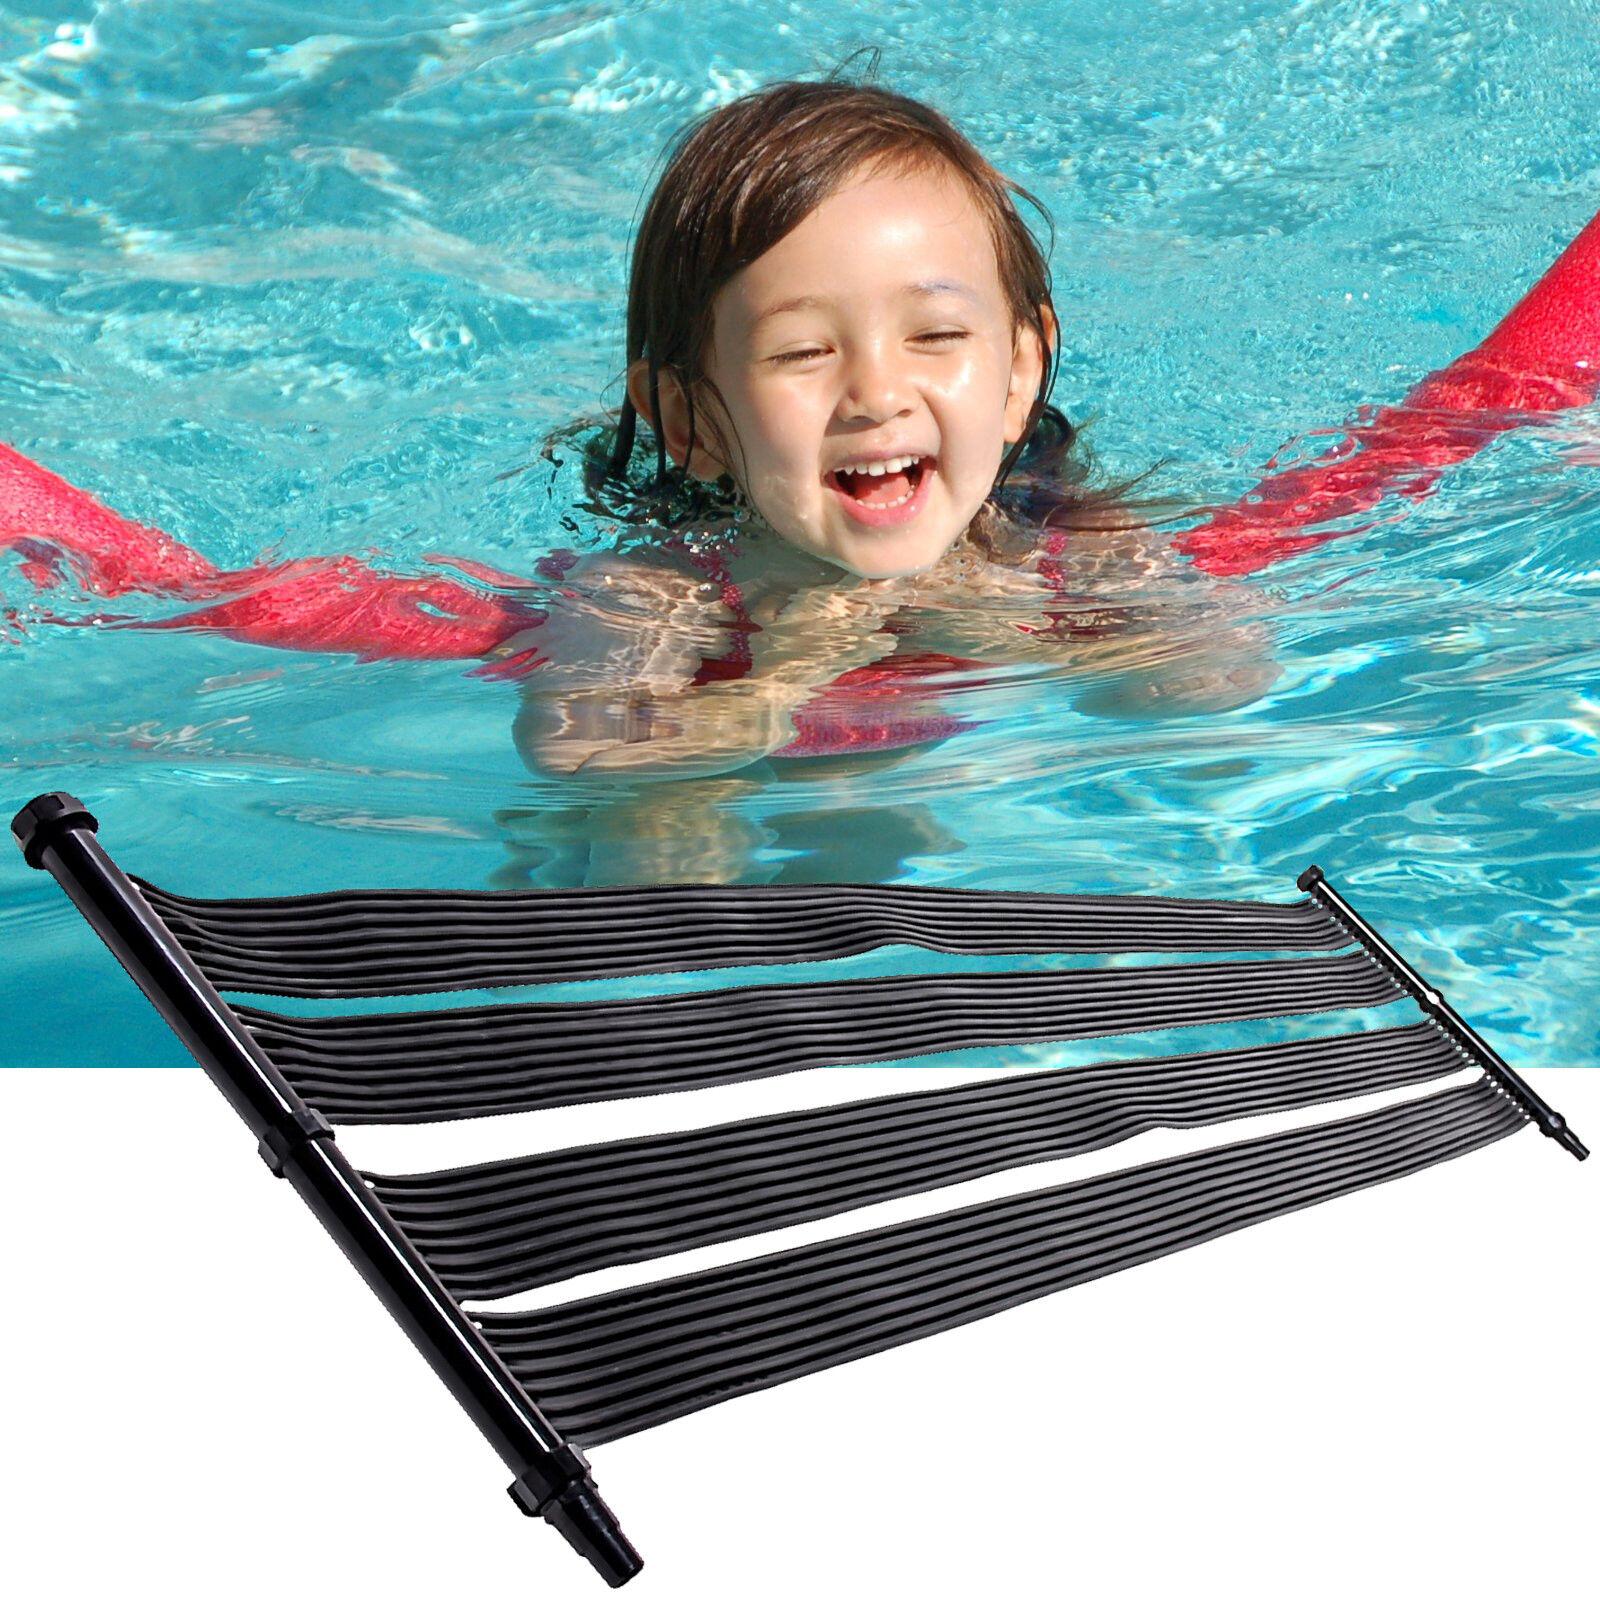 Nemaxx SH300 x 75cm Chauffe-piscine solaire, chauffe piscine, collecteur solaire